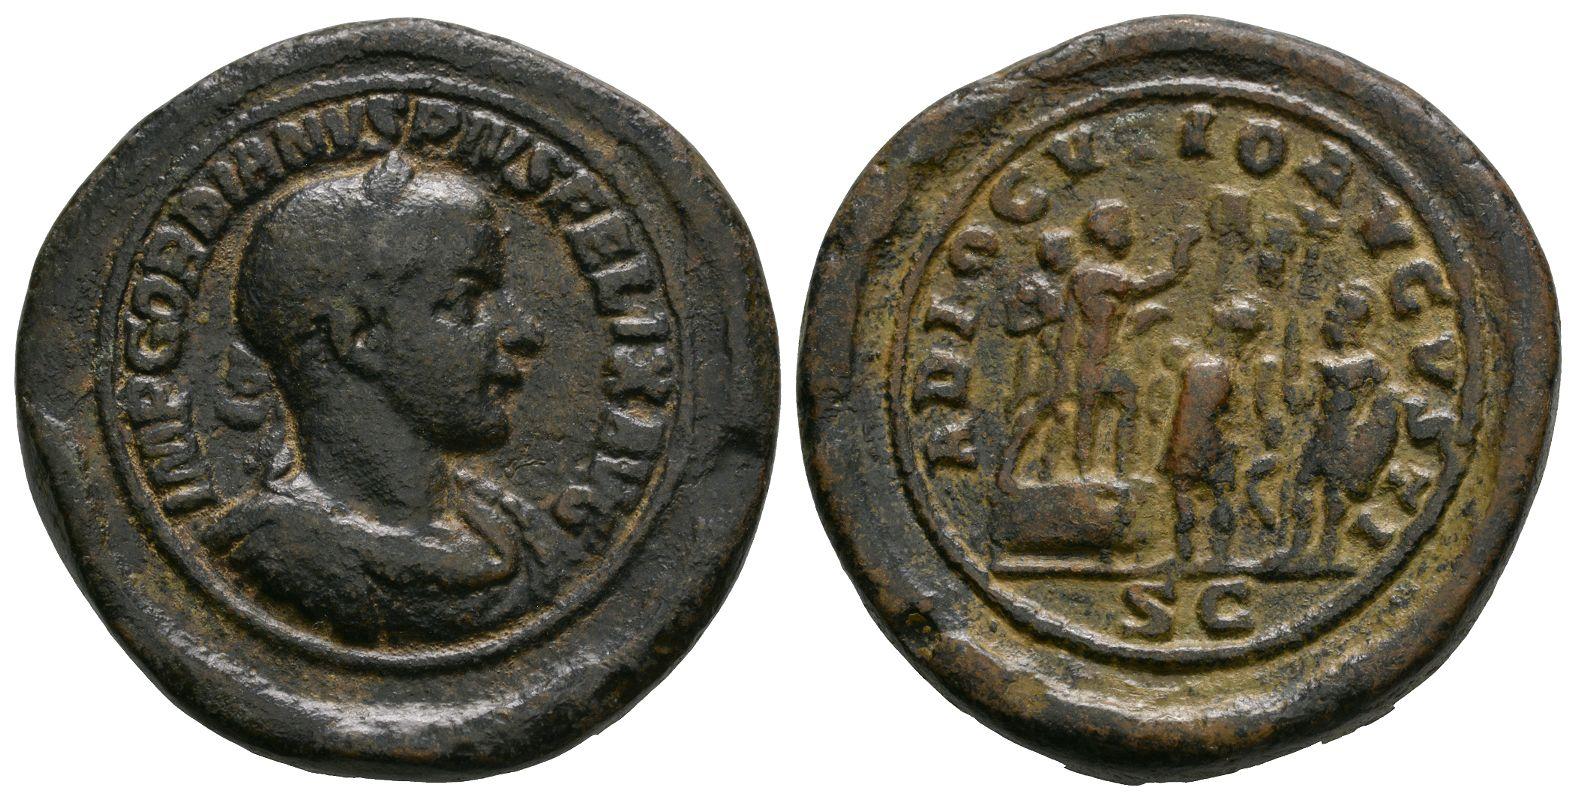 Roman Imperial Coins - Gordian III - Paduan Medallion